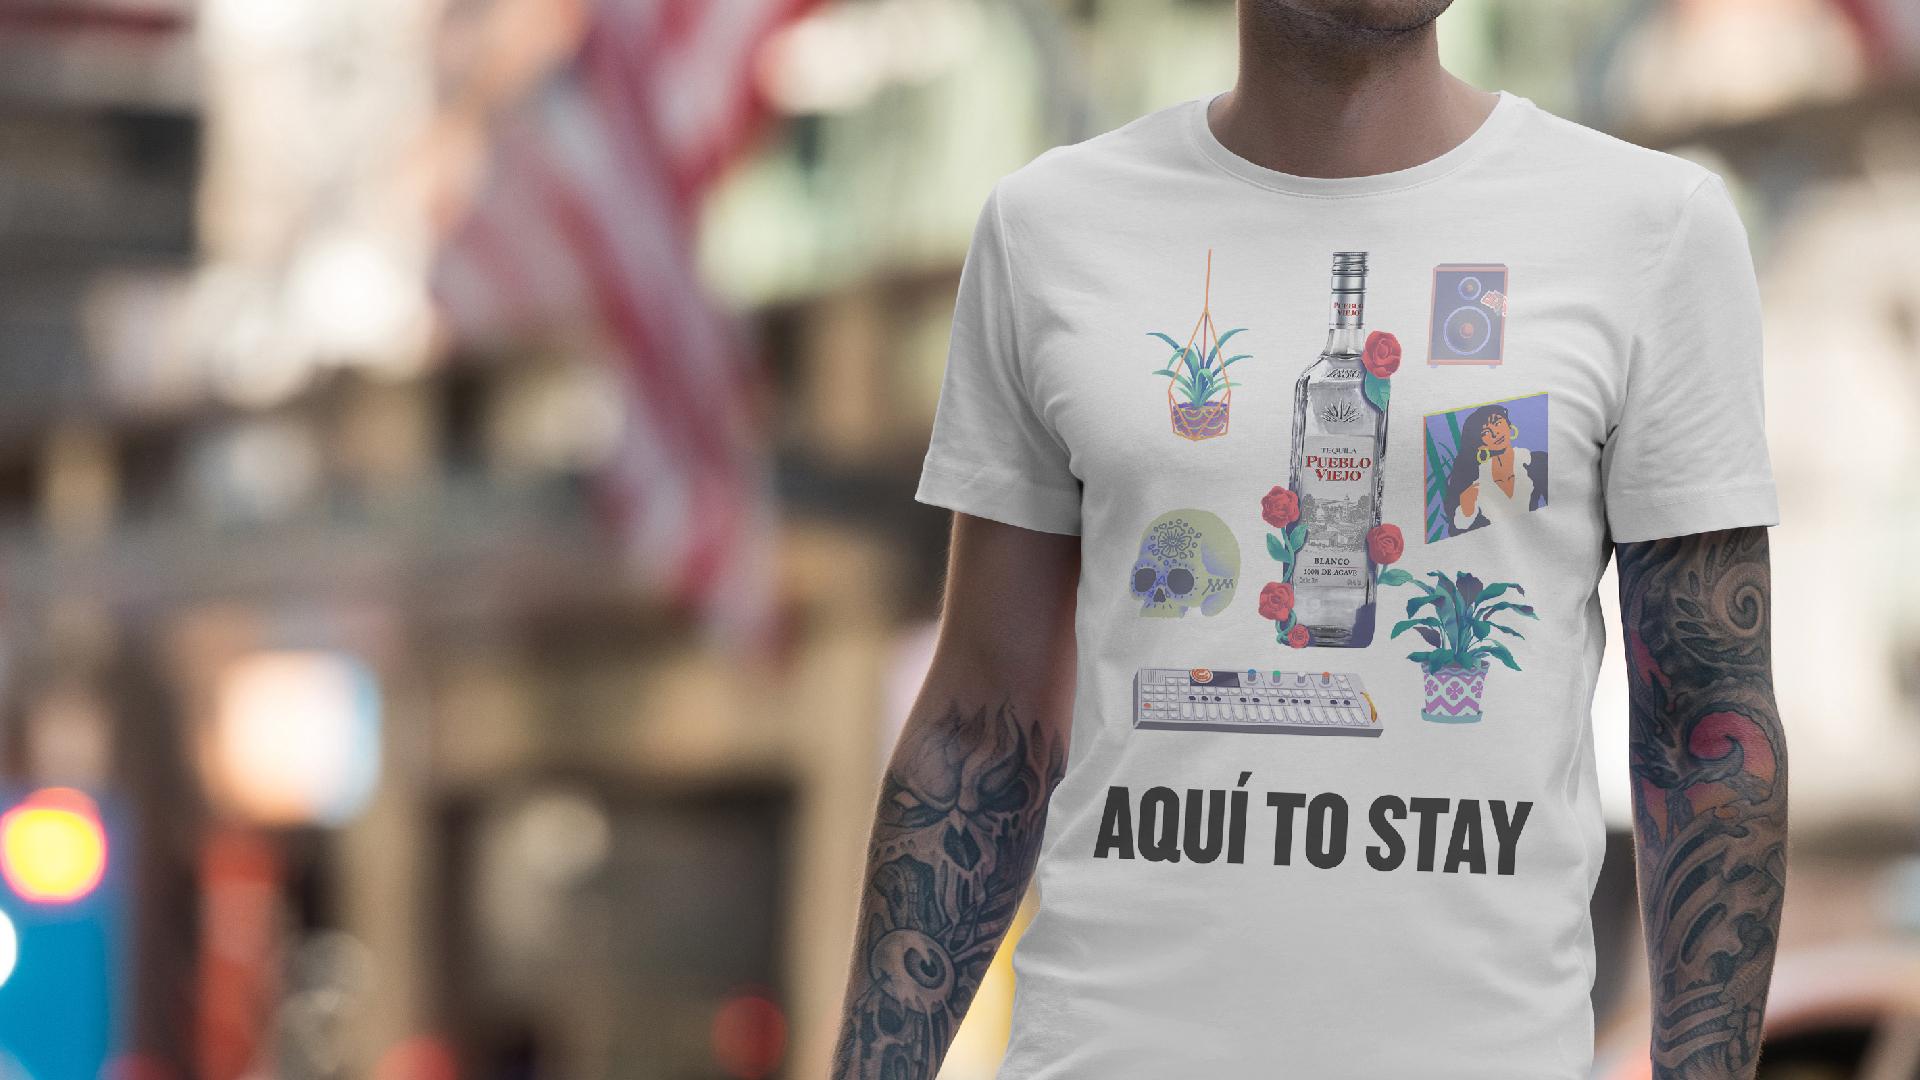 T-shirt graphic design tequila pueblo viejo campaign